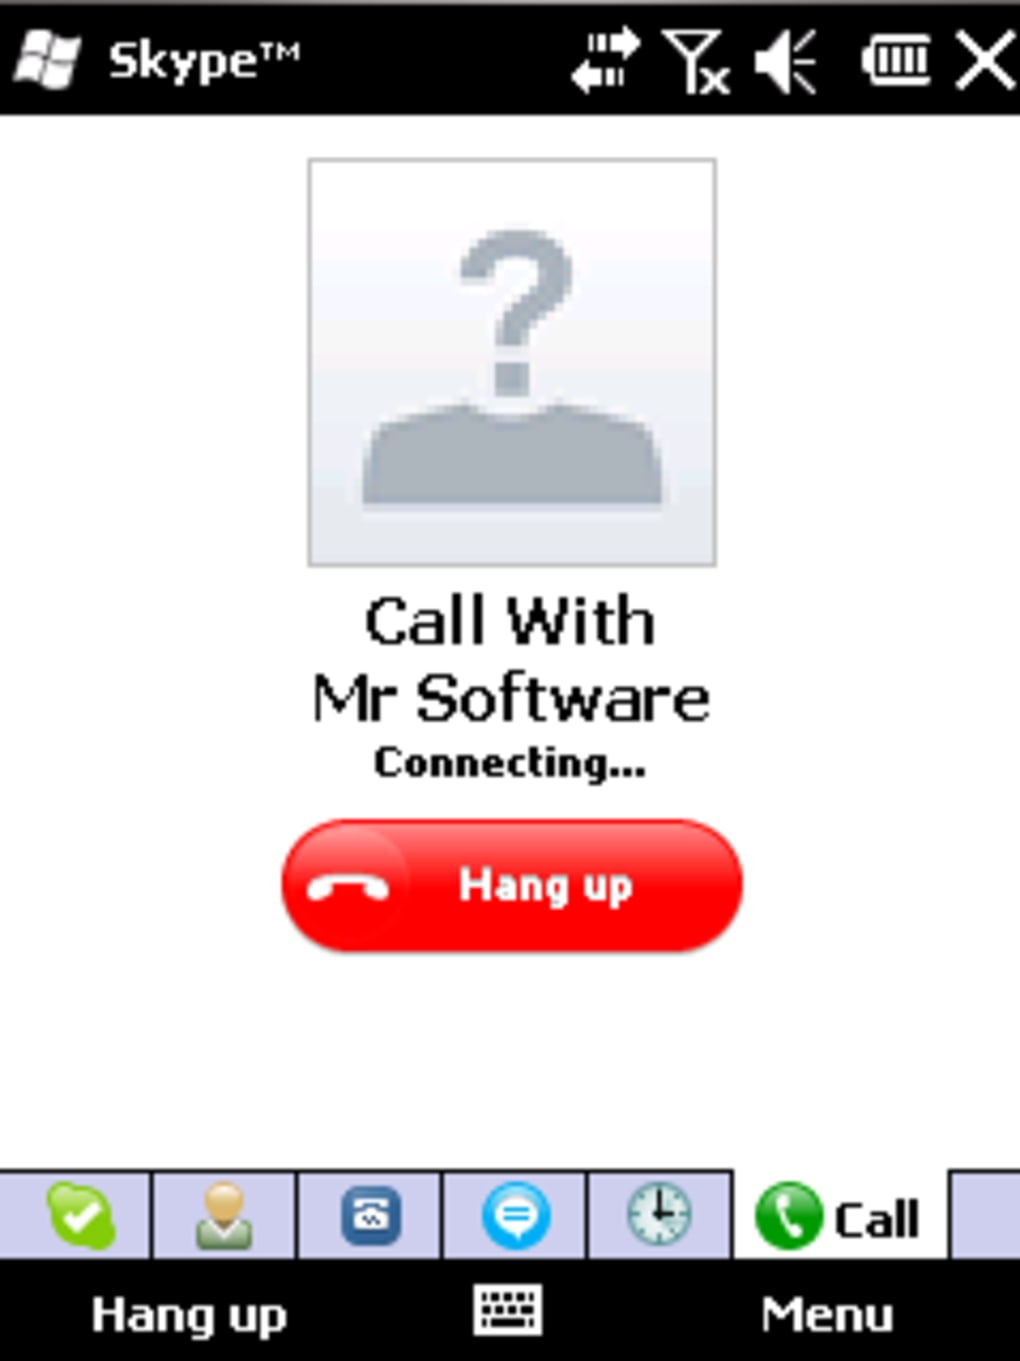 Download skype windows mobile 6. 5.